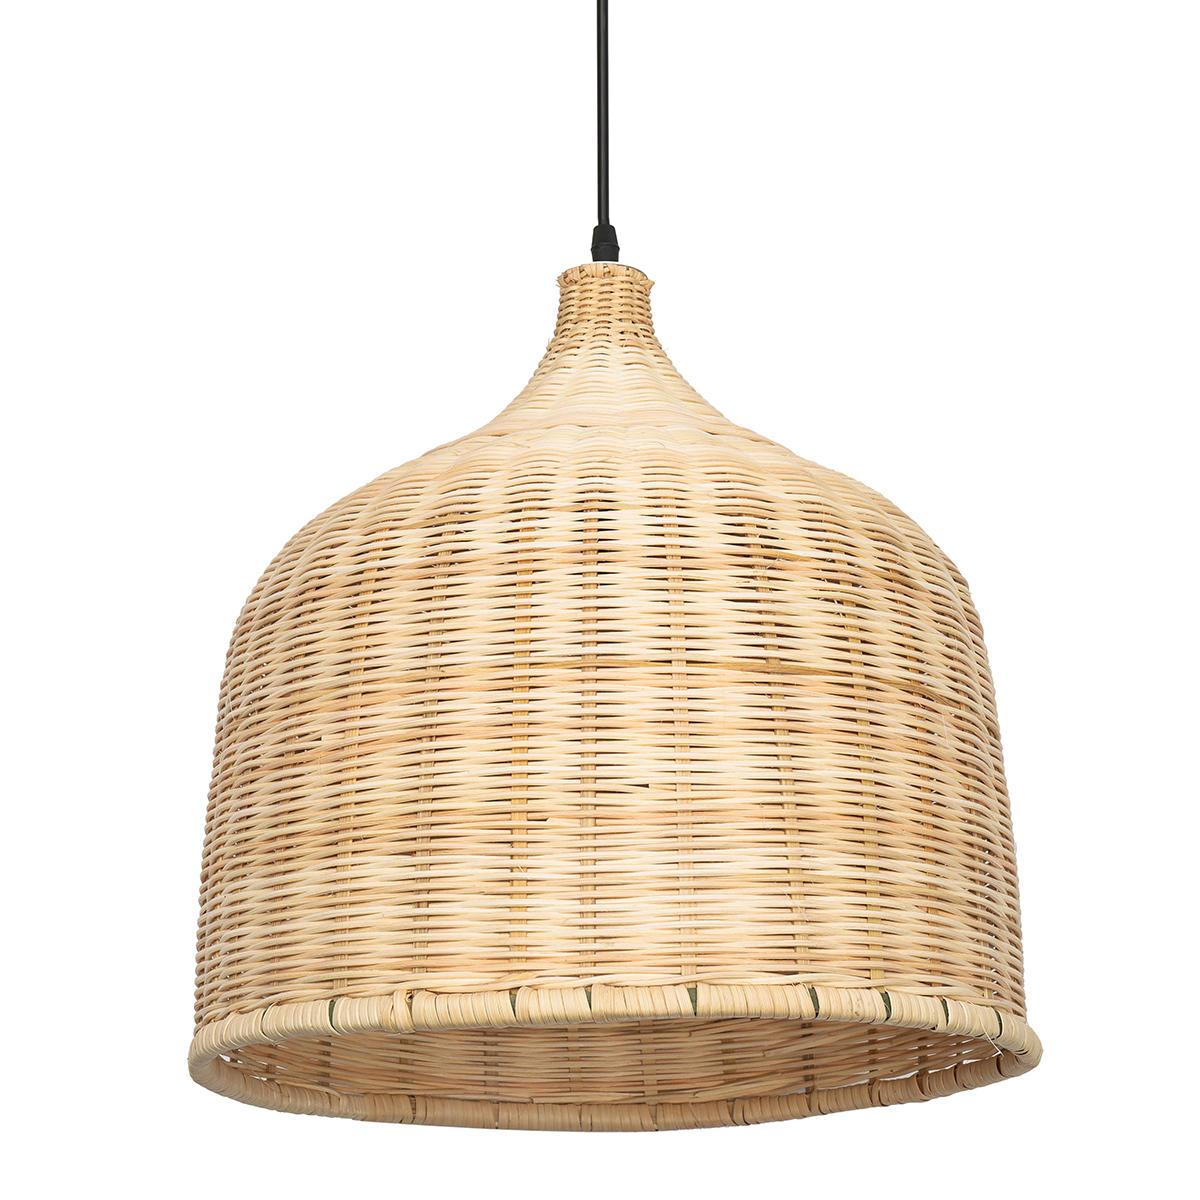 E27 Modern Rattan Chandelier Pendant Light Ceiling Lamp Cover for Home Indoor Decoration